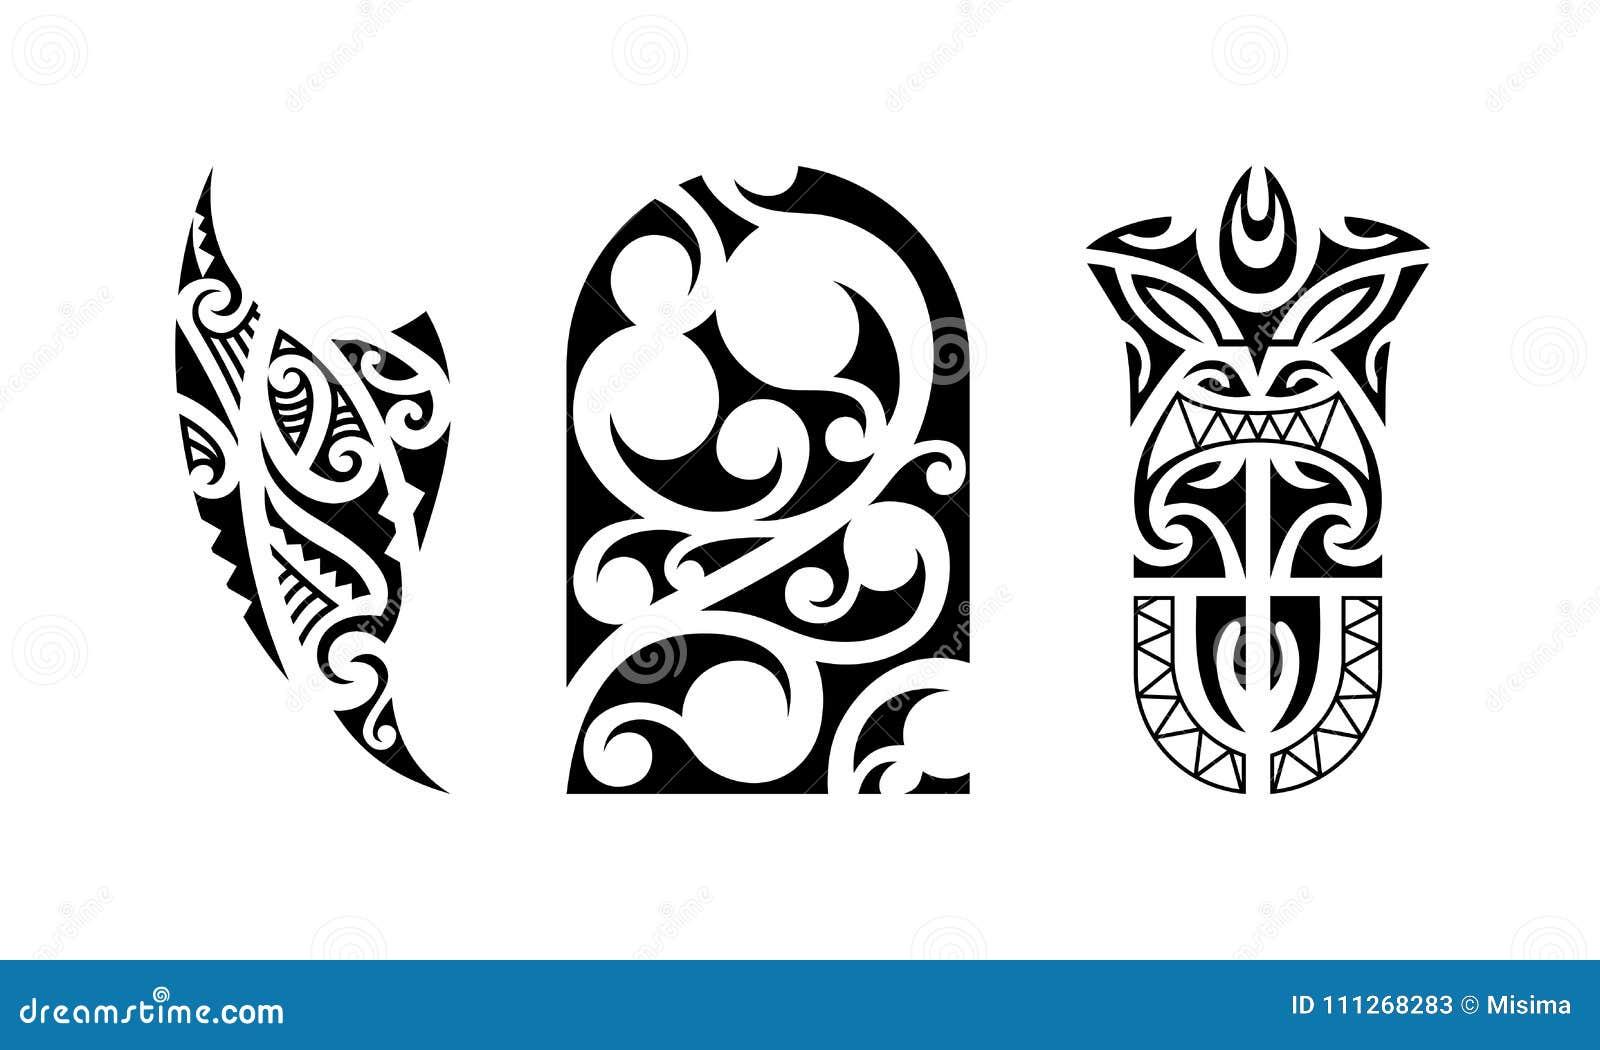 6b4e2a4816e34 Set of polynesian tattoo. Traditional maori tribal ornaments. Vector  pattern illustration.